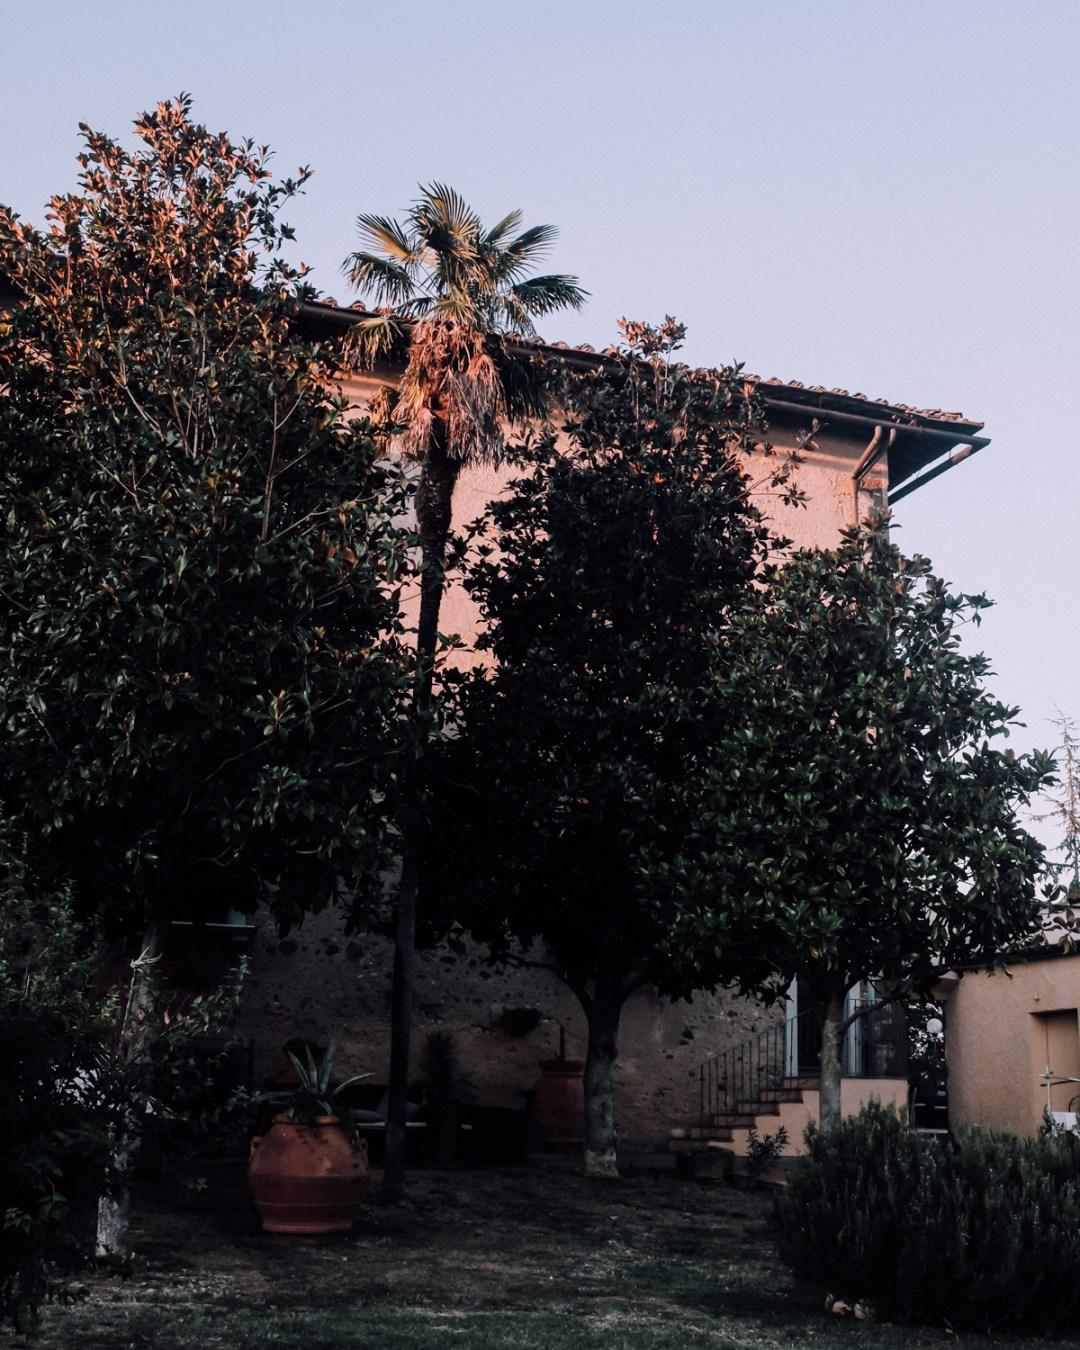 inastil, Ü50Blogger, Reiseblogger, Toskana, Villa, Florenz, Siena, Certaldo, Lifestyle, Italienreise, Italienliebe, Cabriotour-7